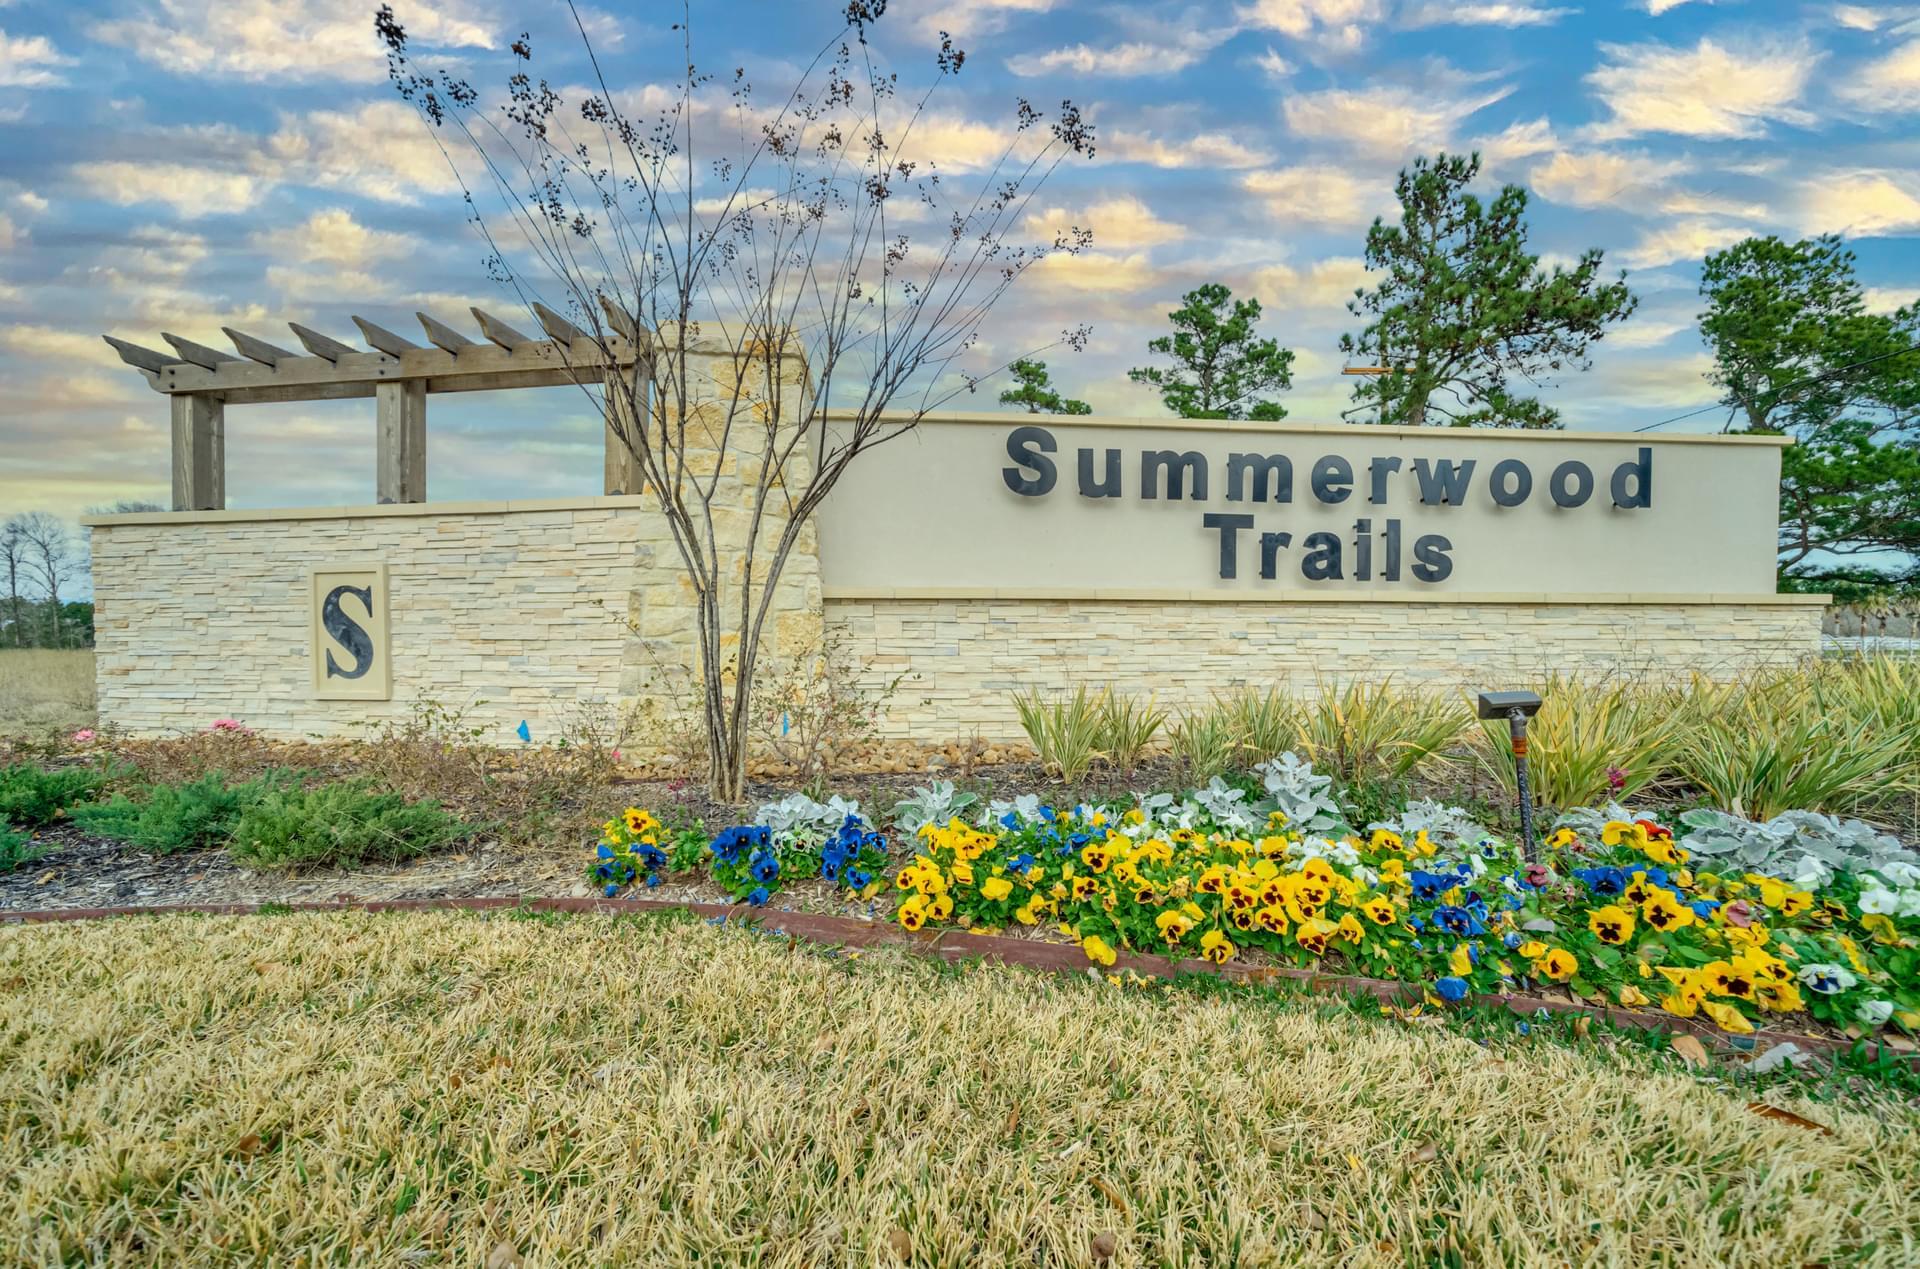 Summerwood Trails in Willis, TX